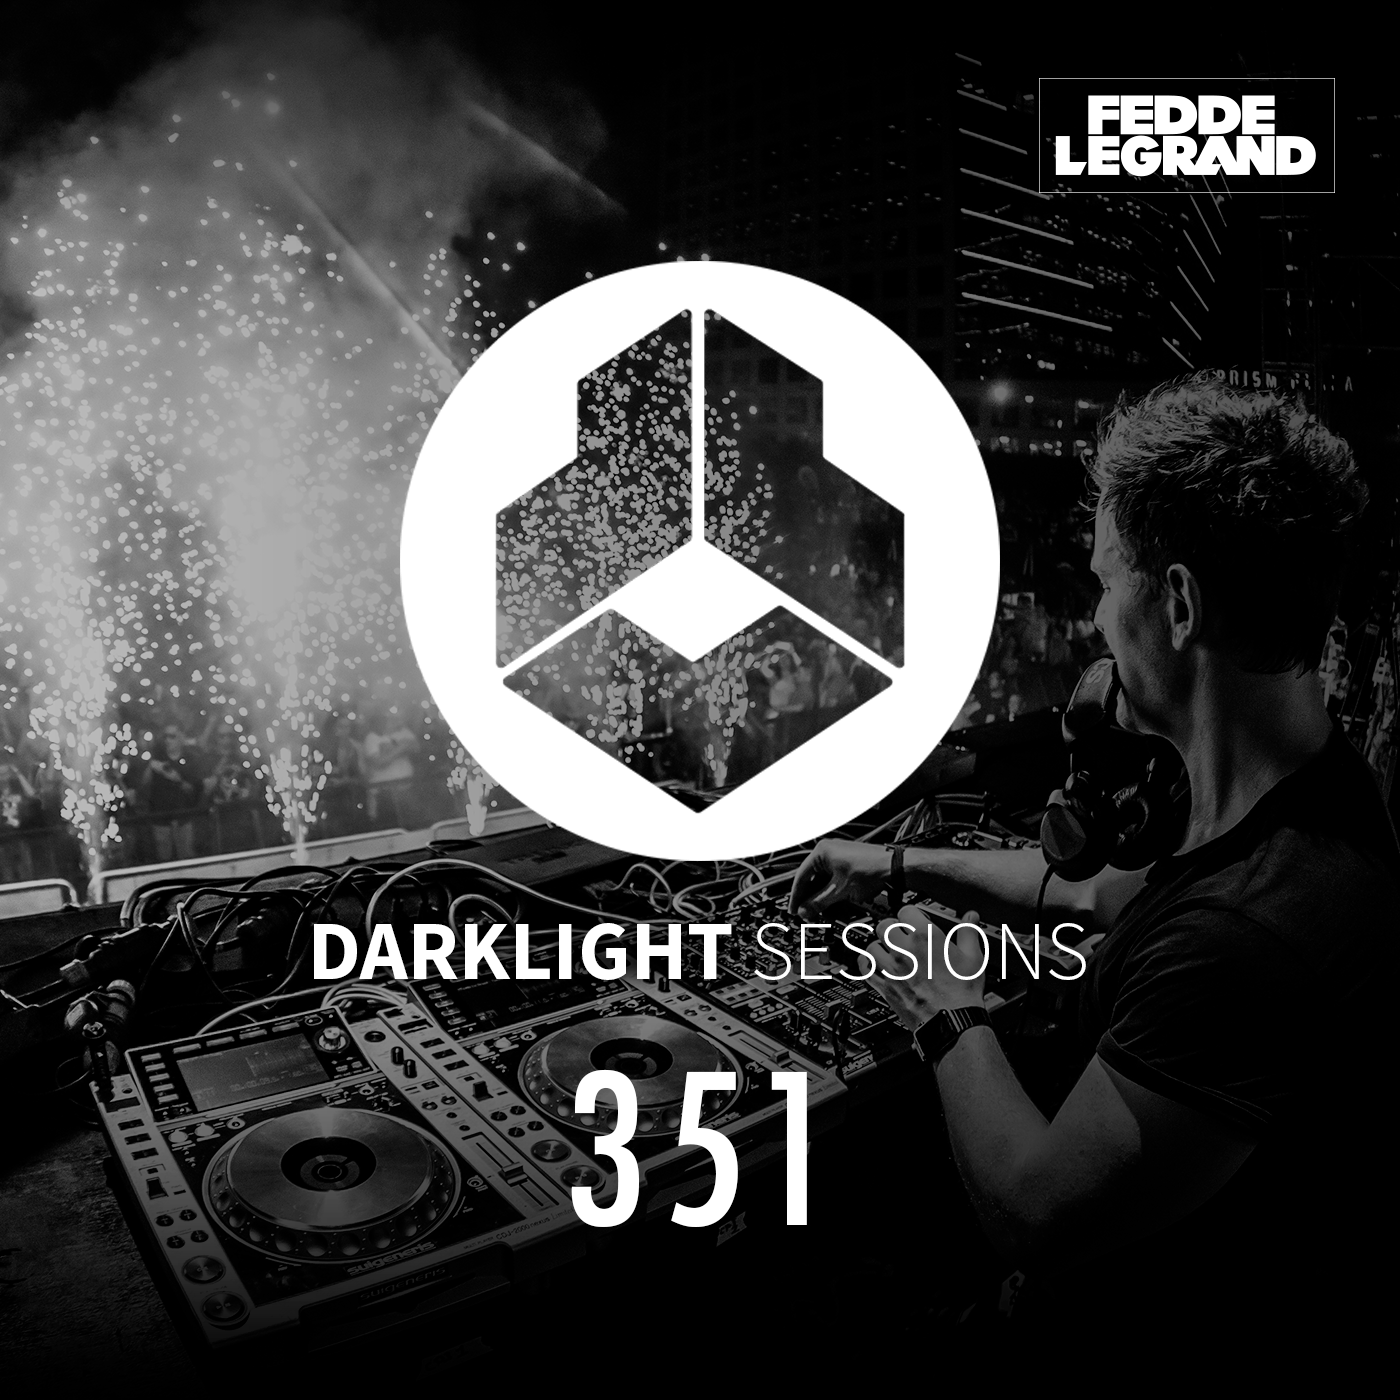 Darklight Sessions 351